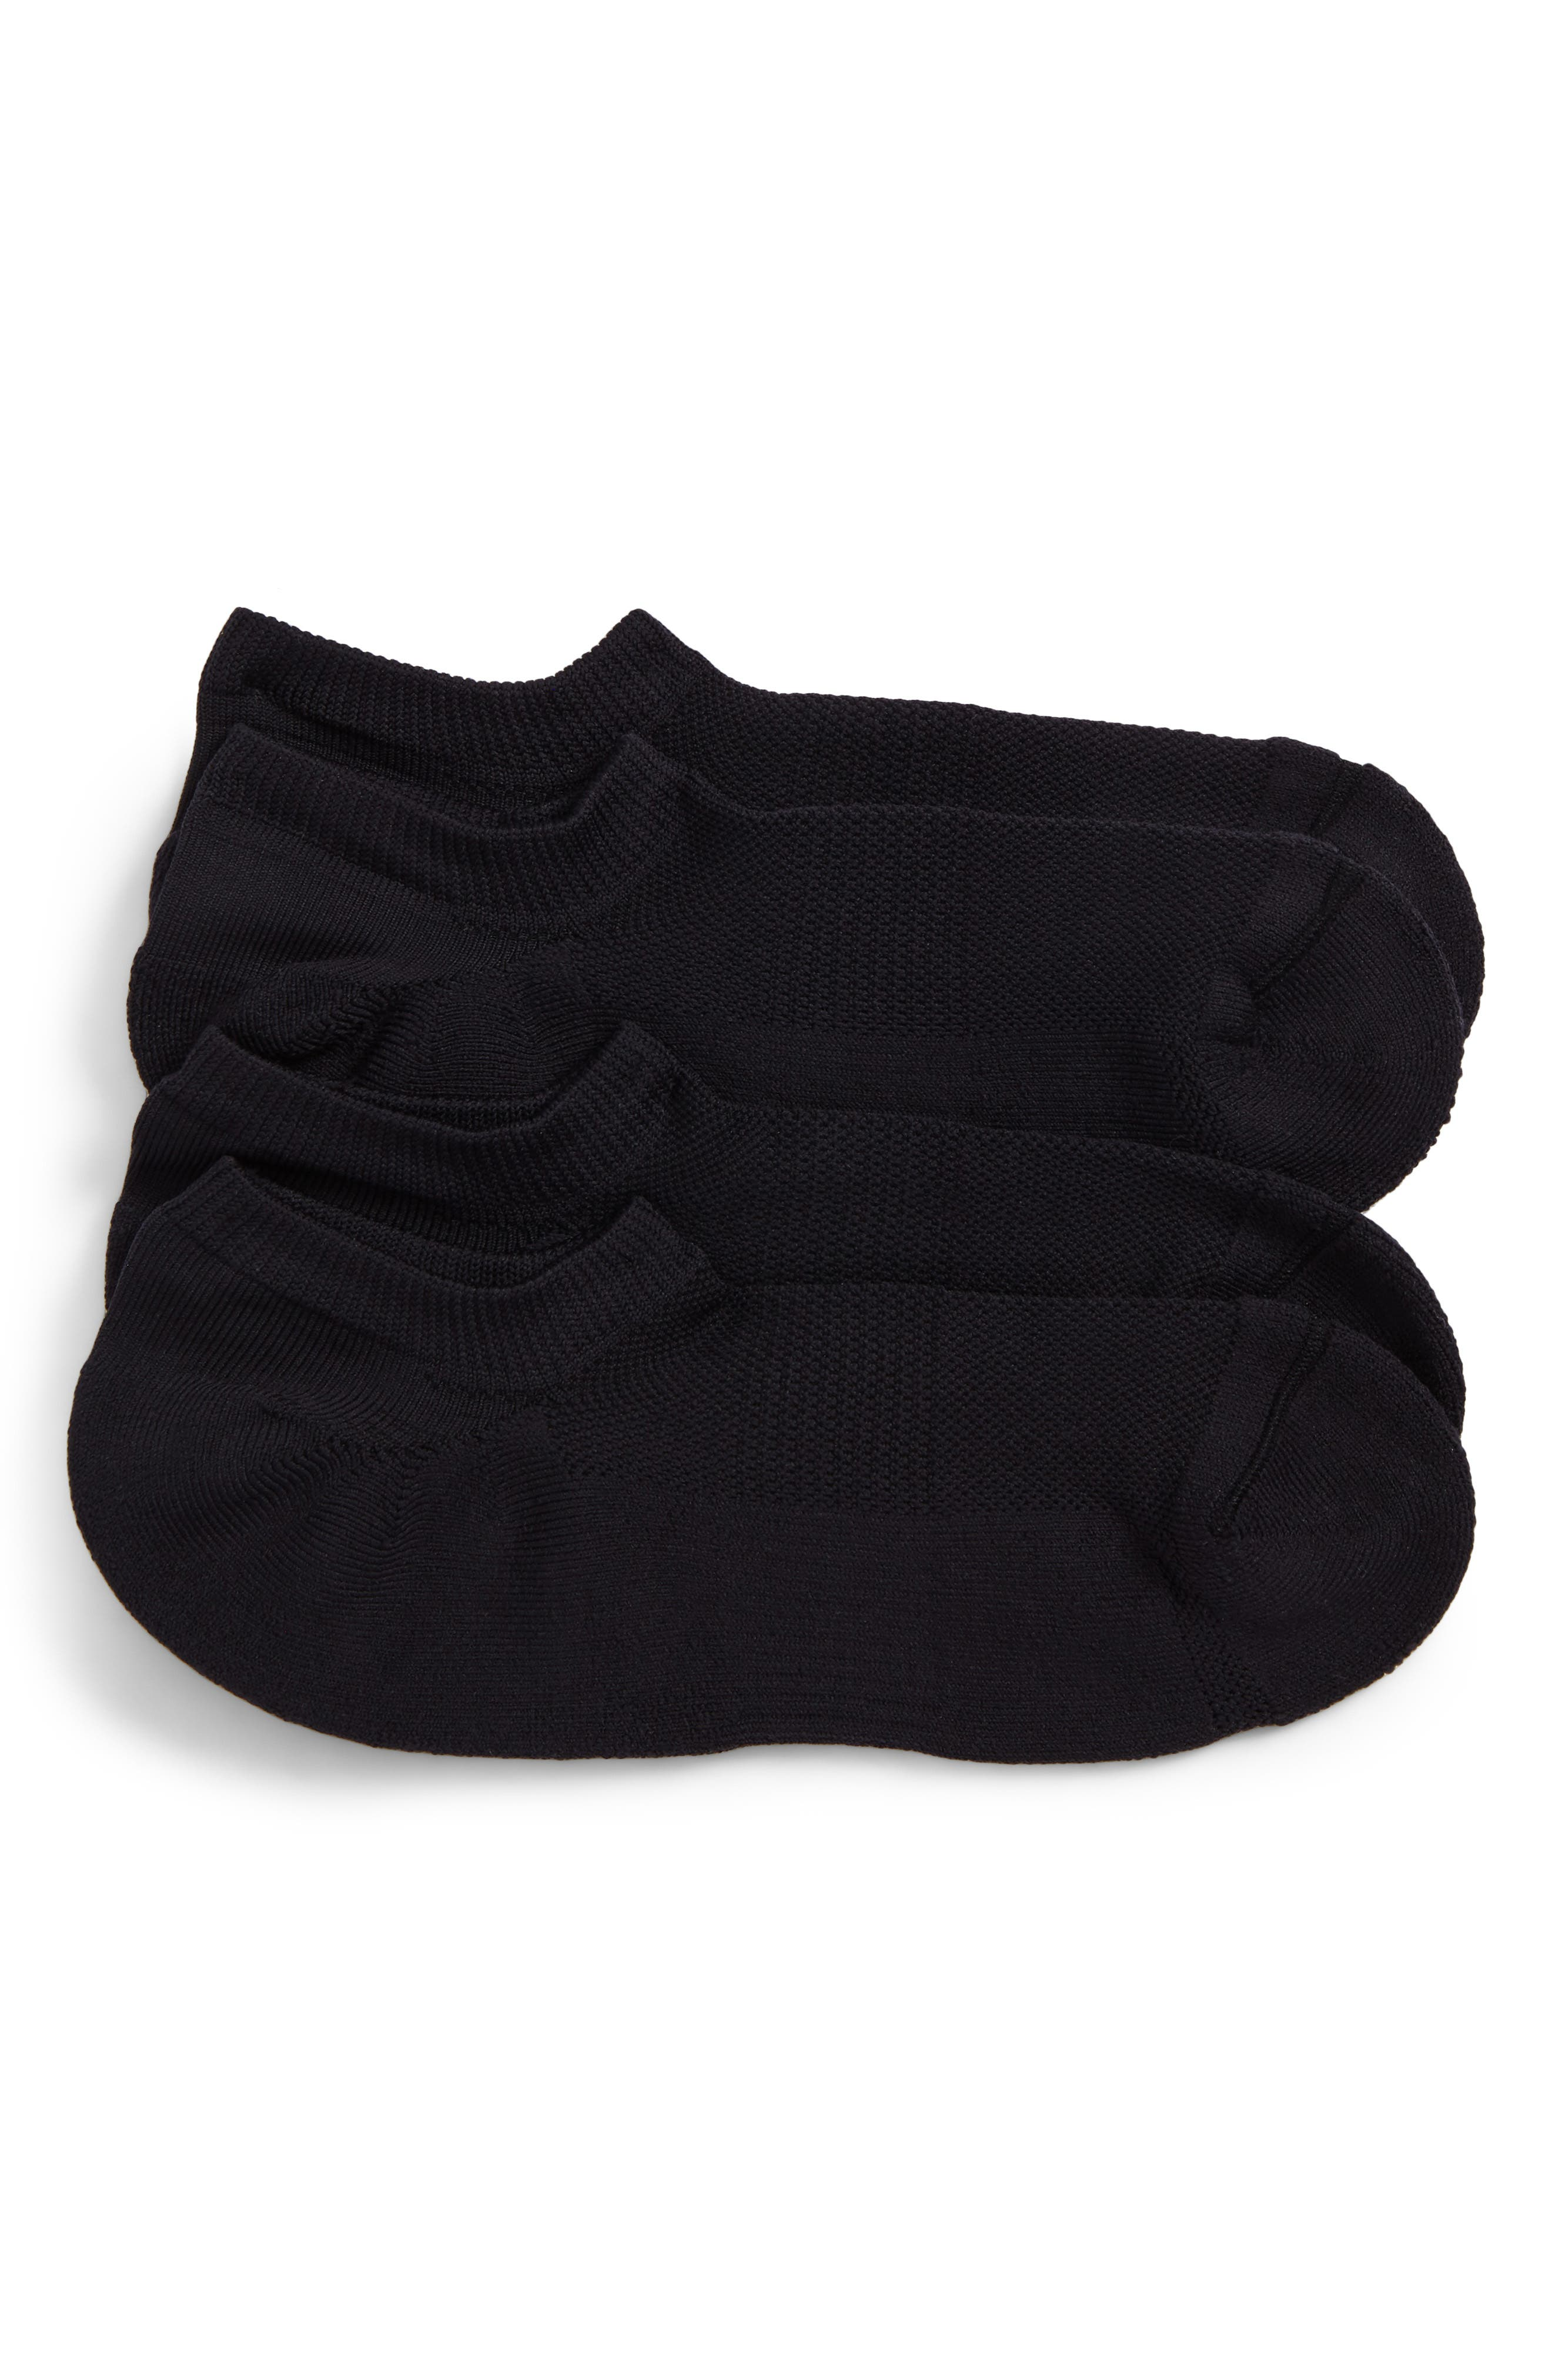 Tech-Smart 2-Pack No-Show Socks,                         Main,                         color, 001